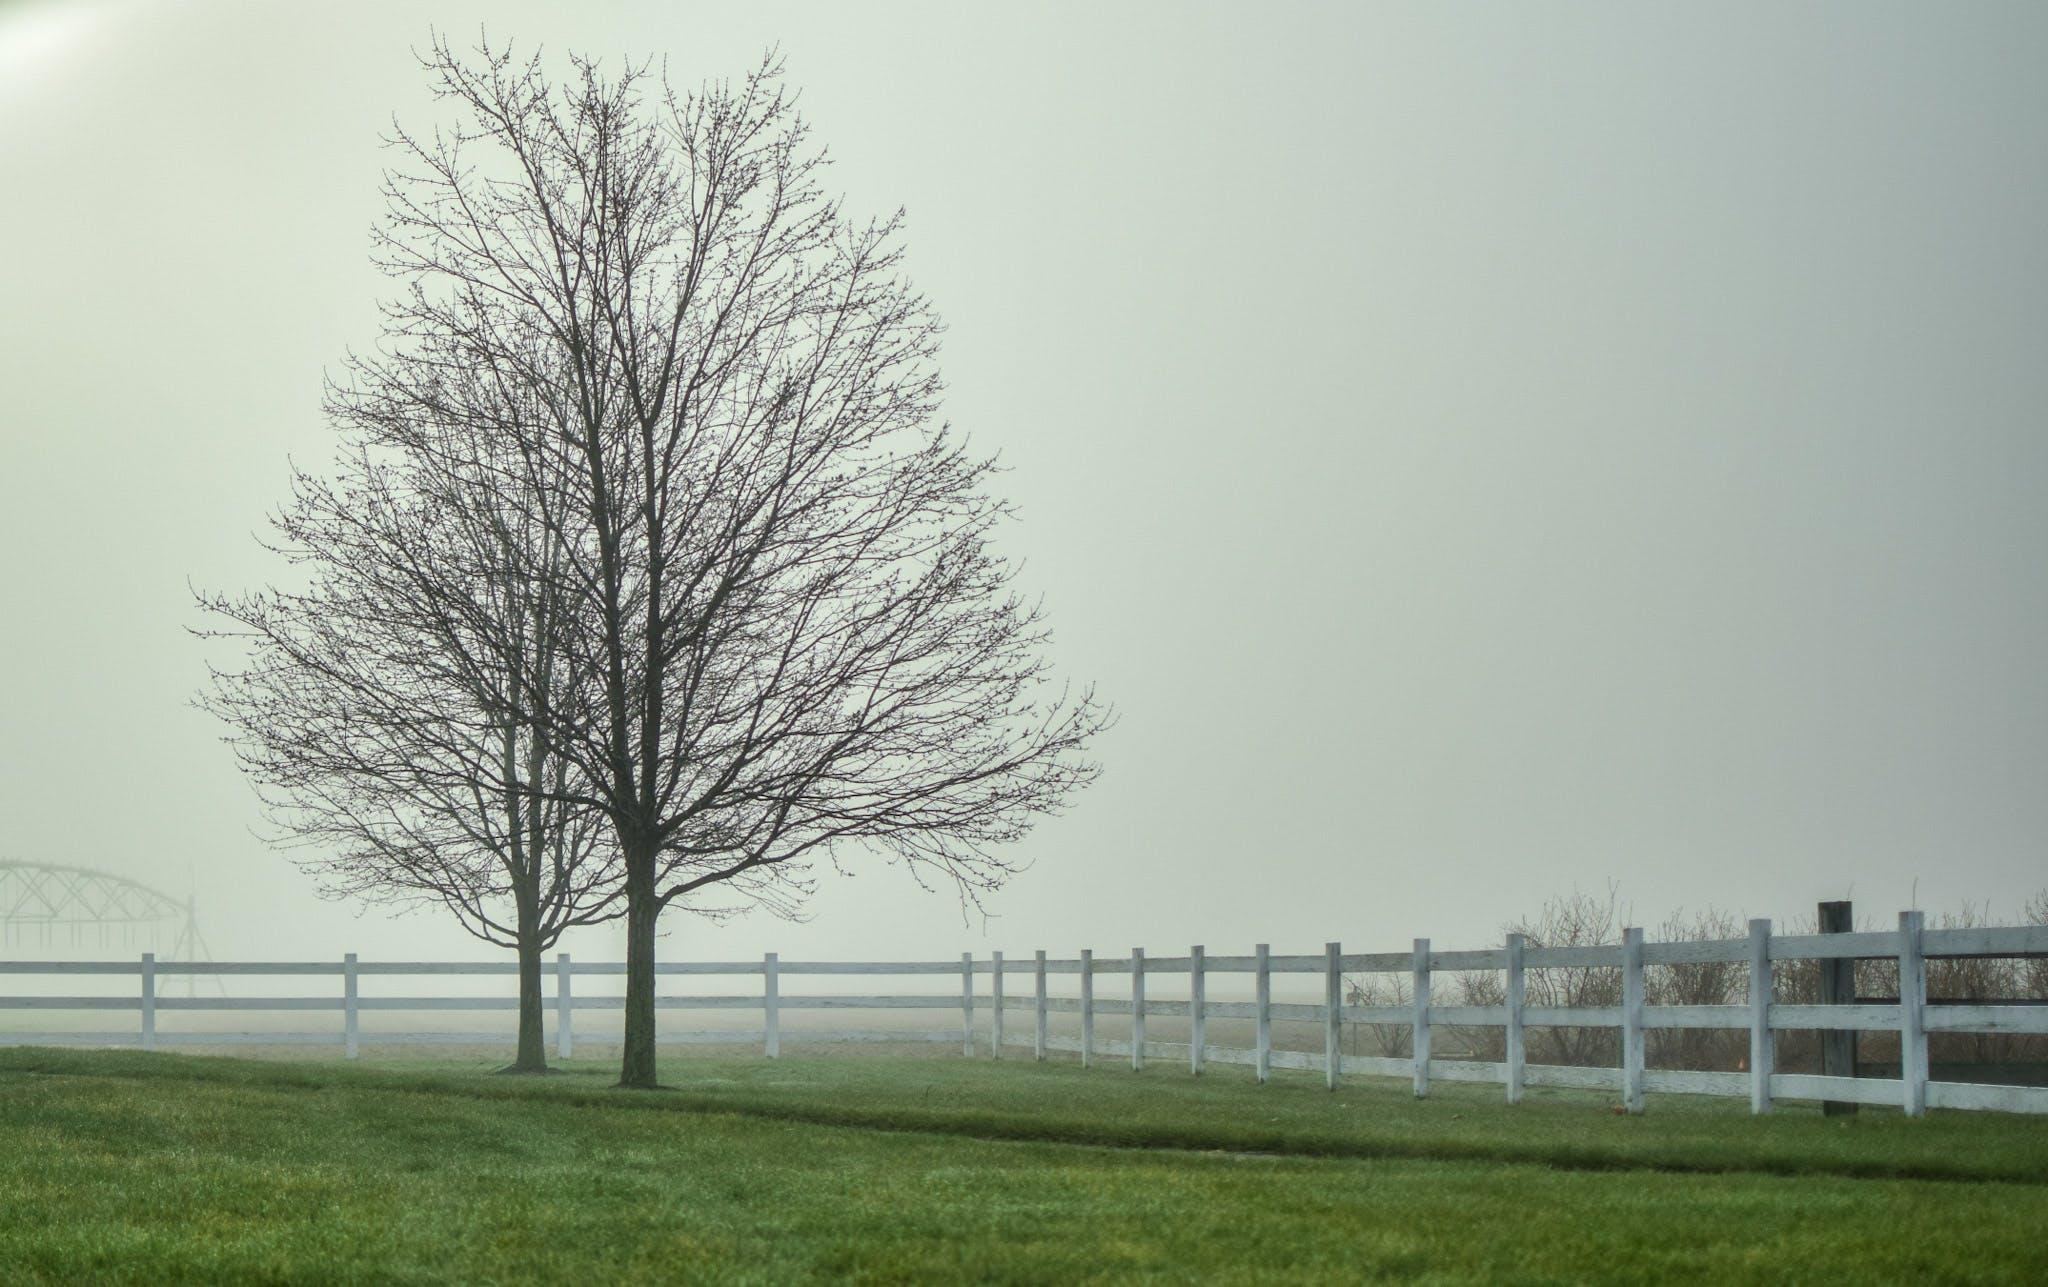 Free stock photo of farm, fence, landscape, trees